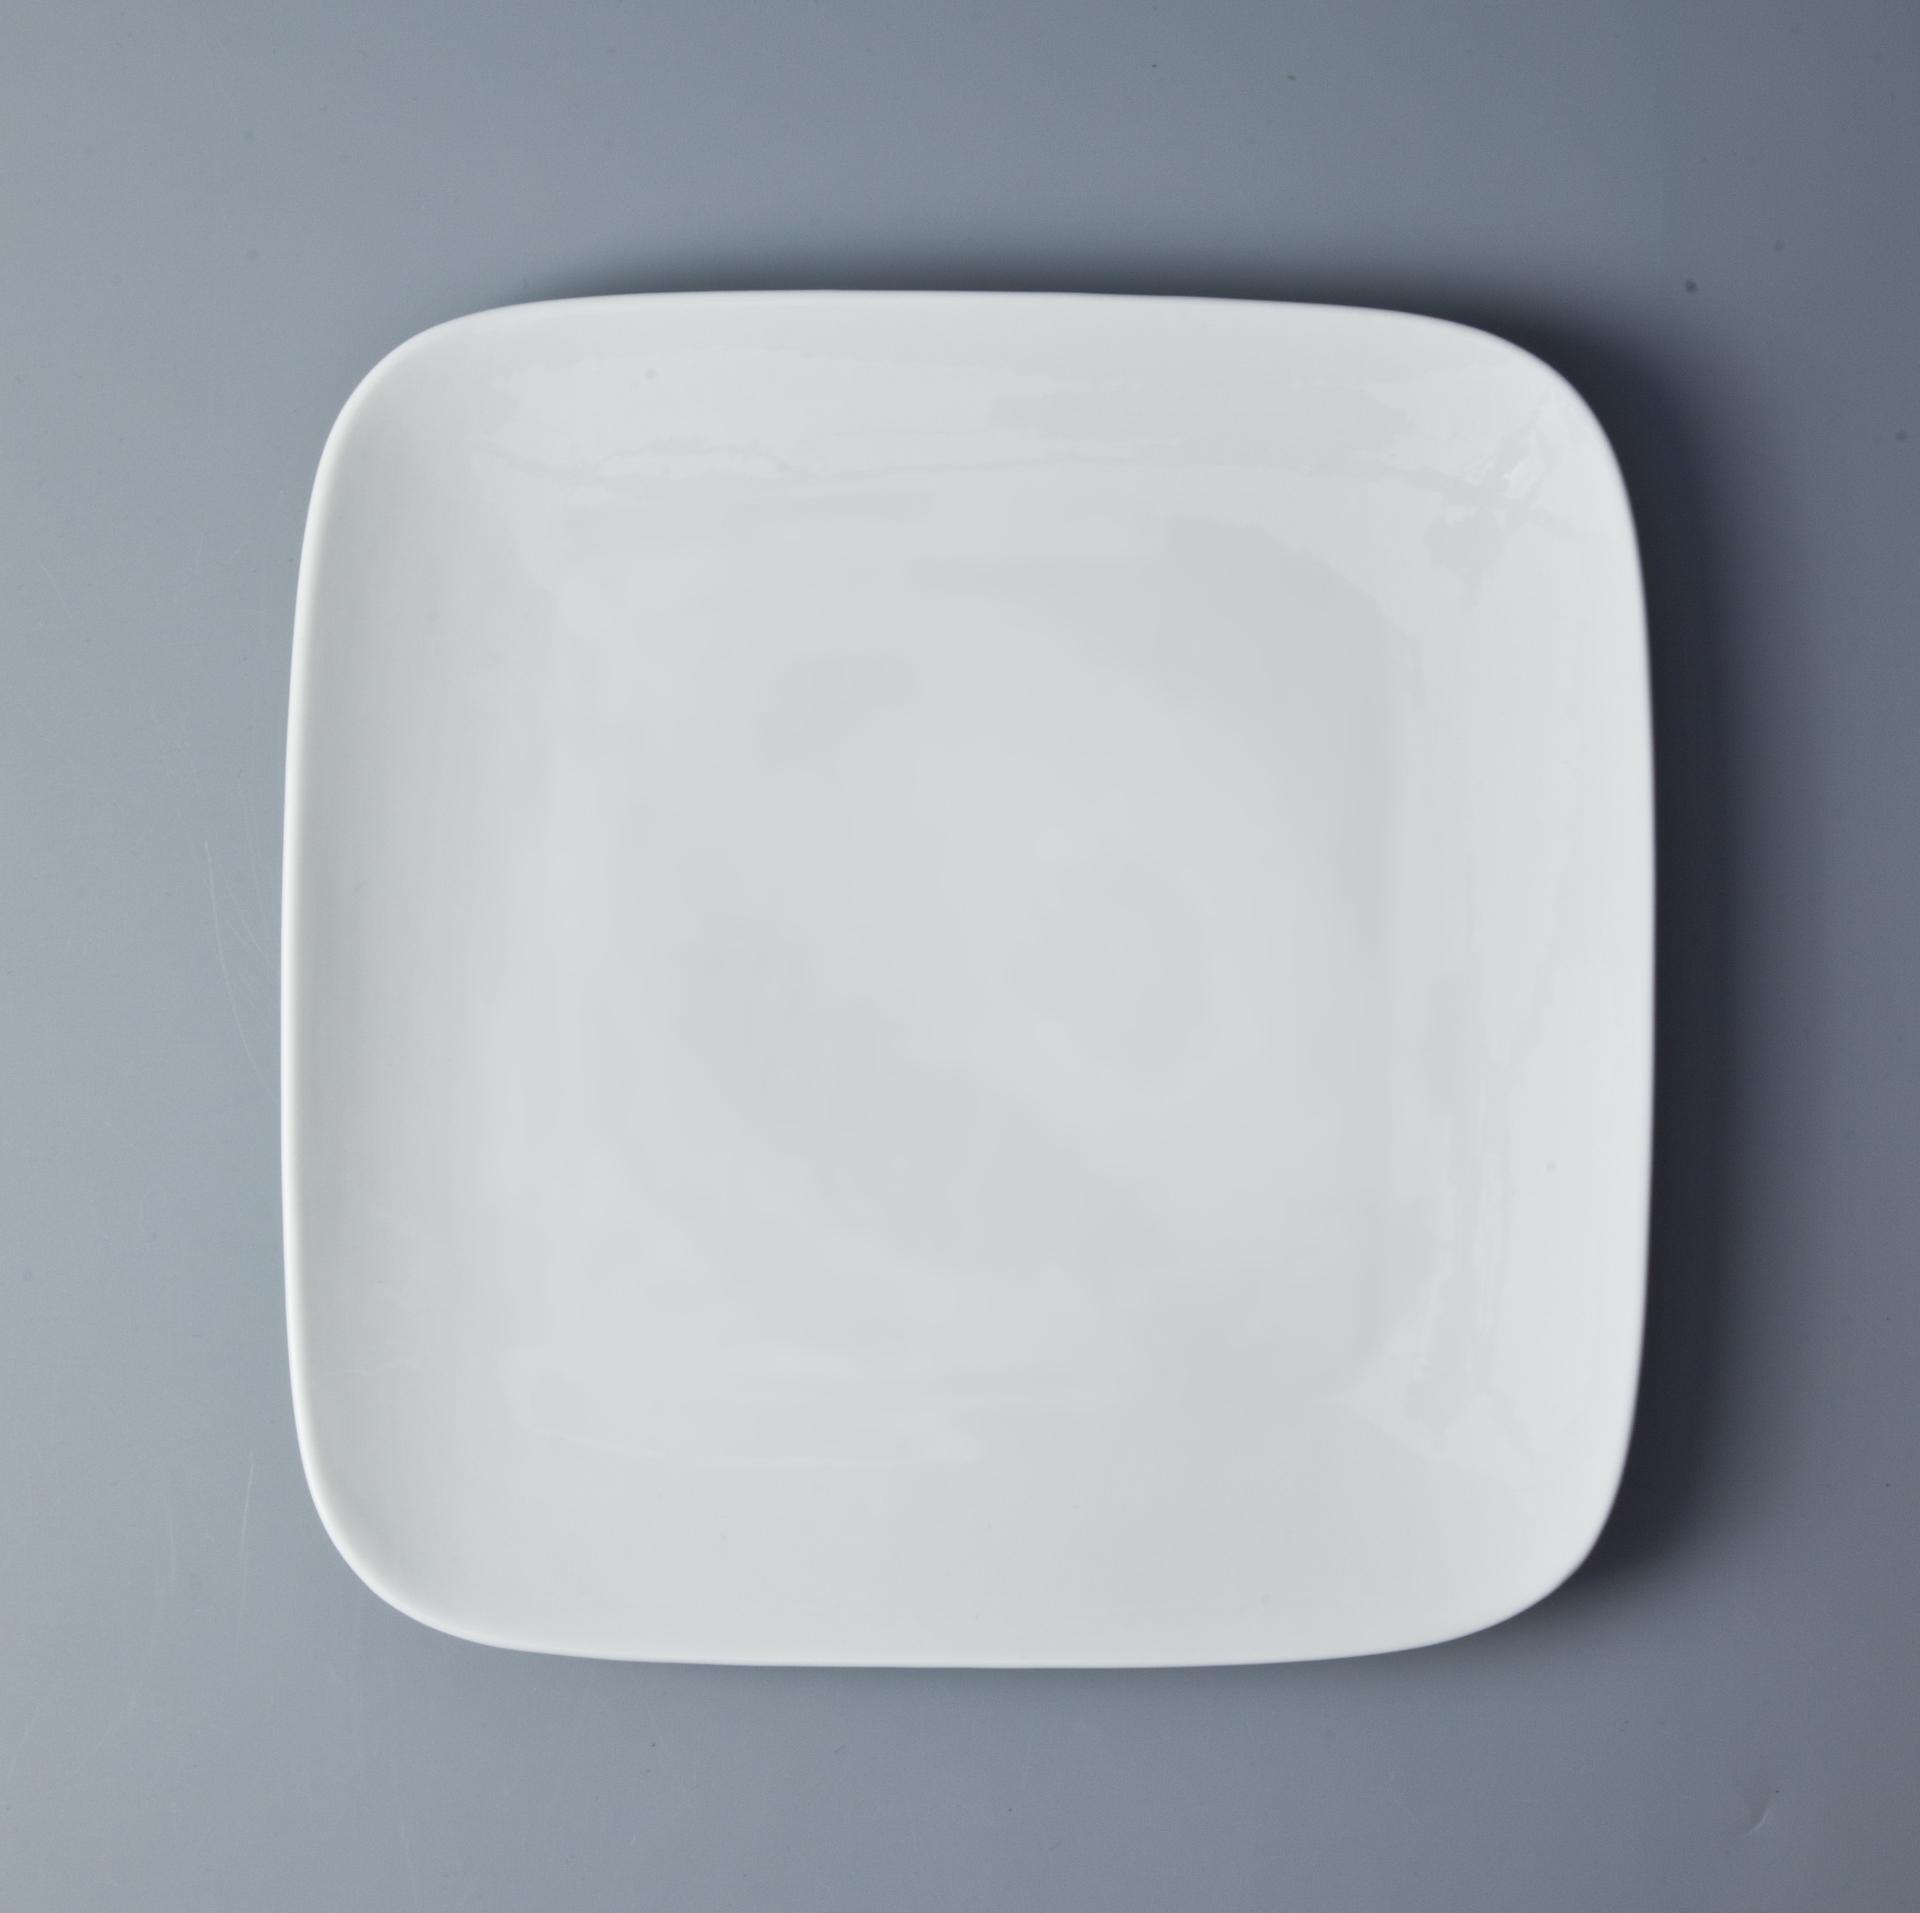 Bulk Porcelain Cheap Price Appetizer Plates, Square Dessert Plate, Party Tableware#